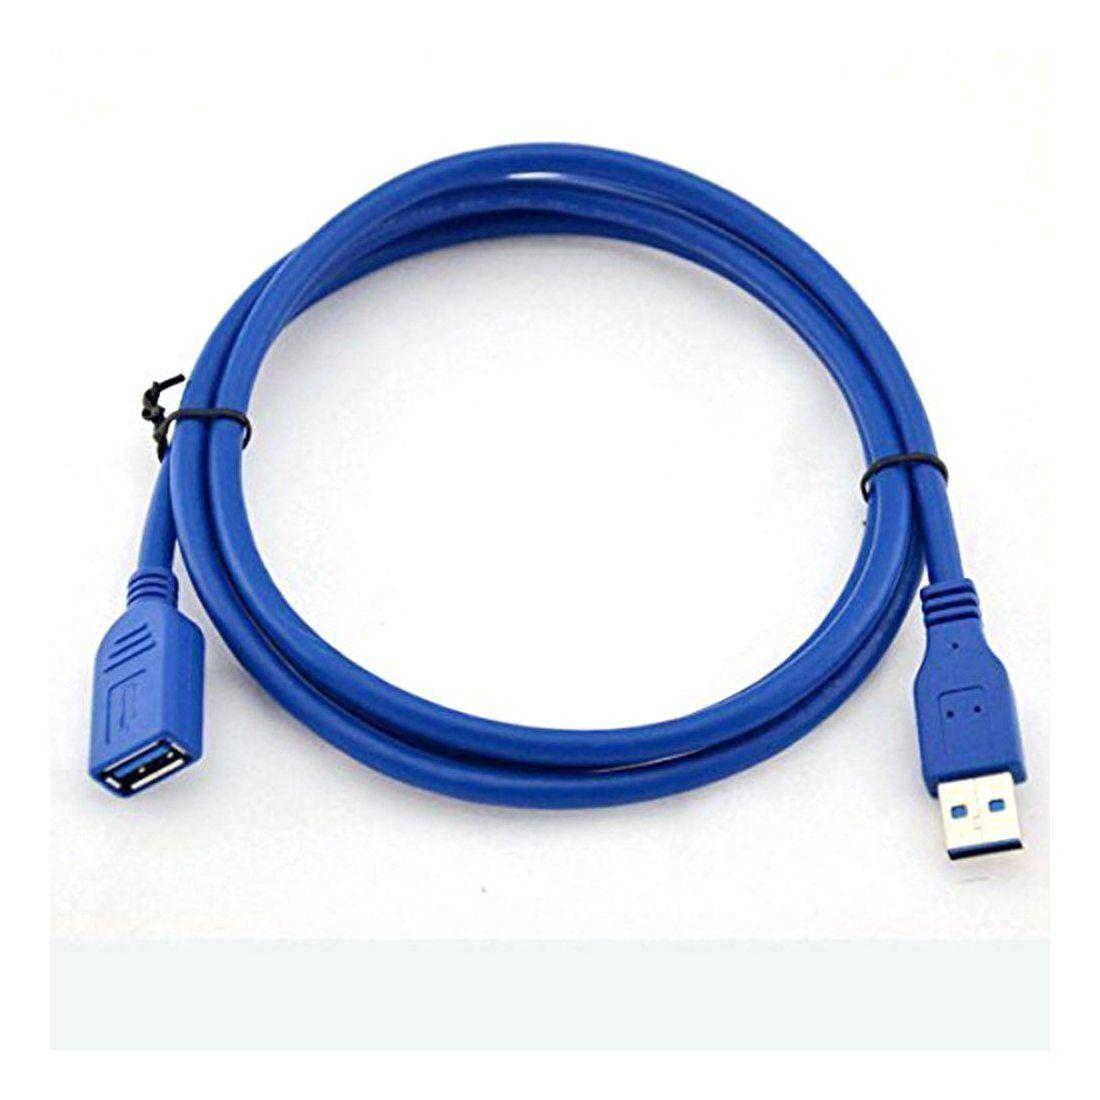 Zheino 0.5M Rallonge Câble USB 3.0 mâle A vers femelle USB 3.0-SuperSpeed A vers AM To AF d'Extension Rallonge câble, Bleu US